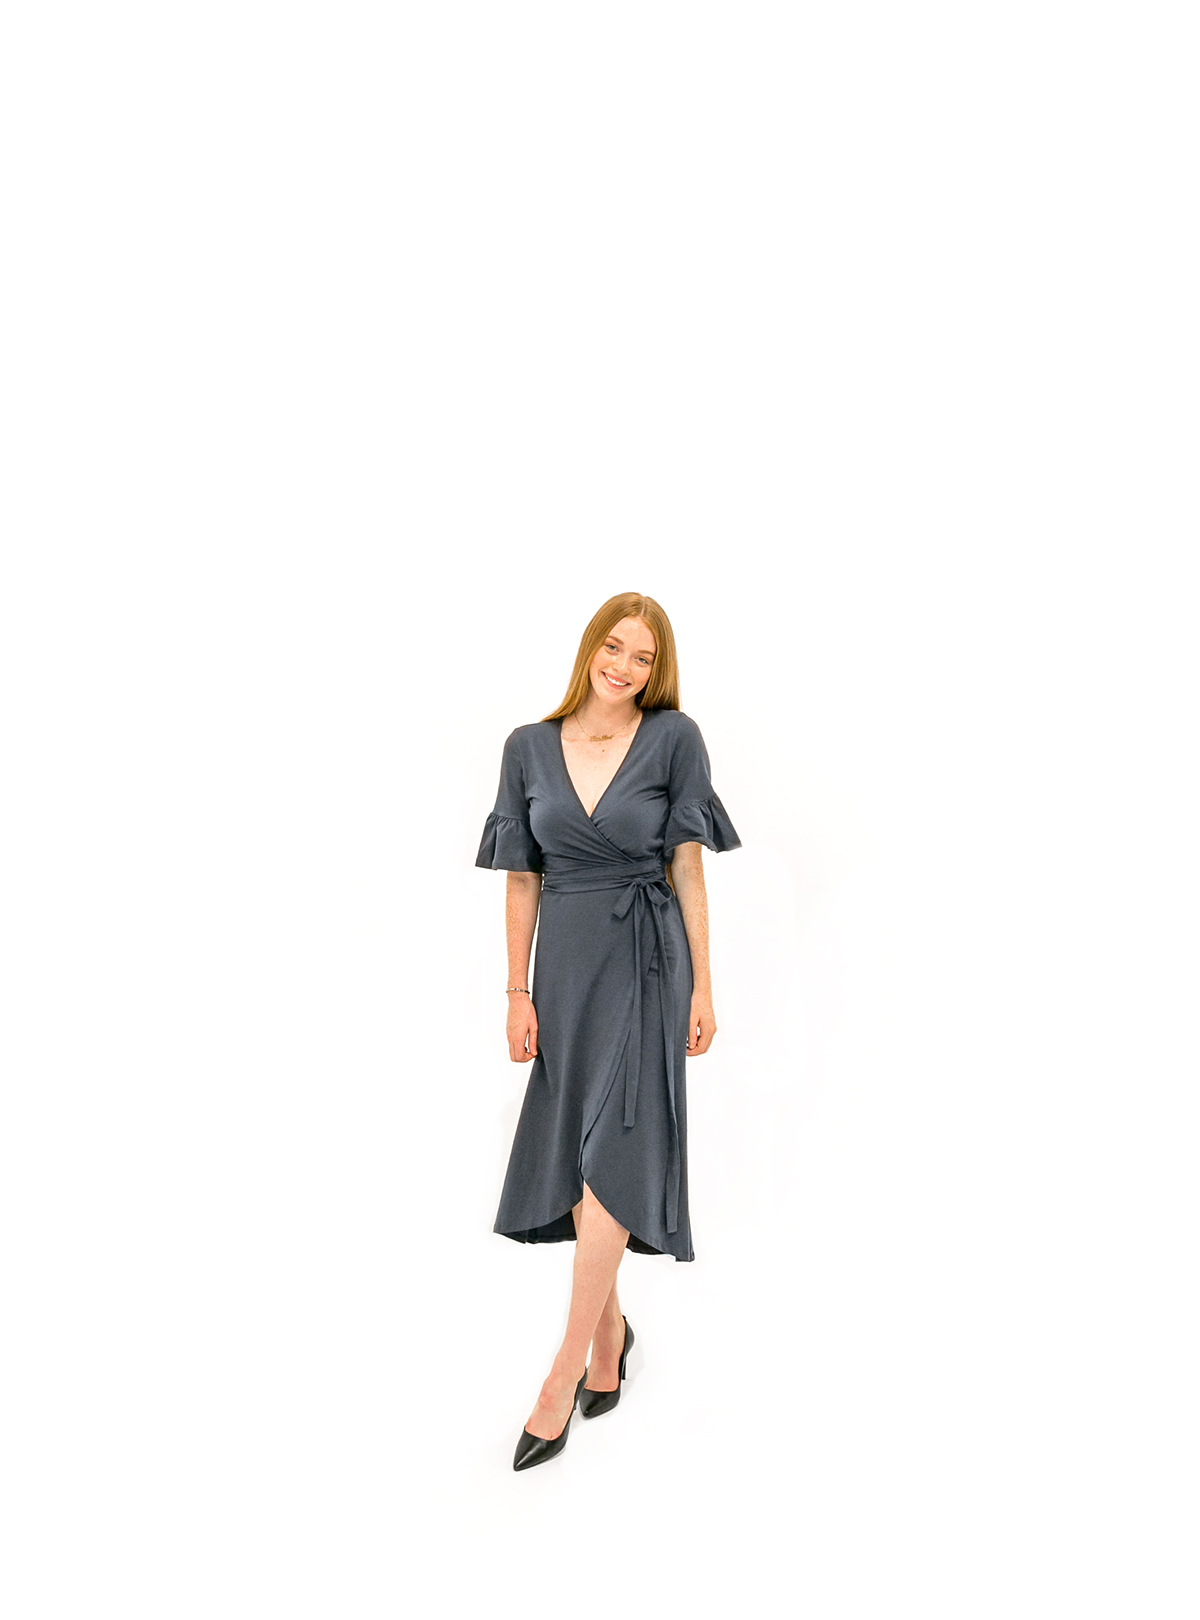 The Danielle Dress - Indigo